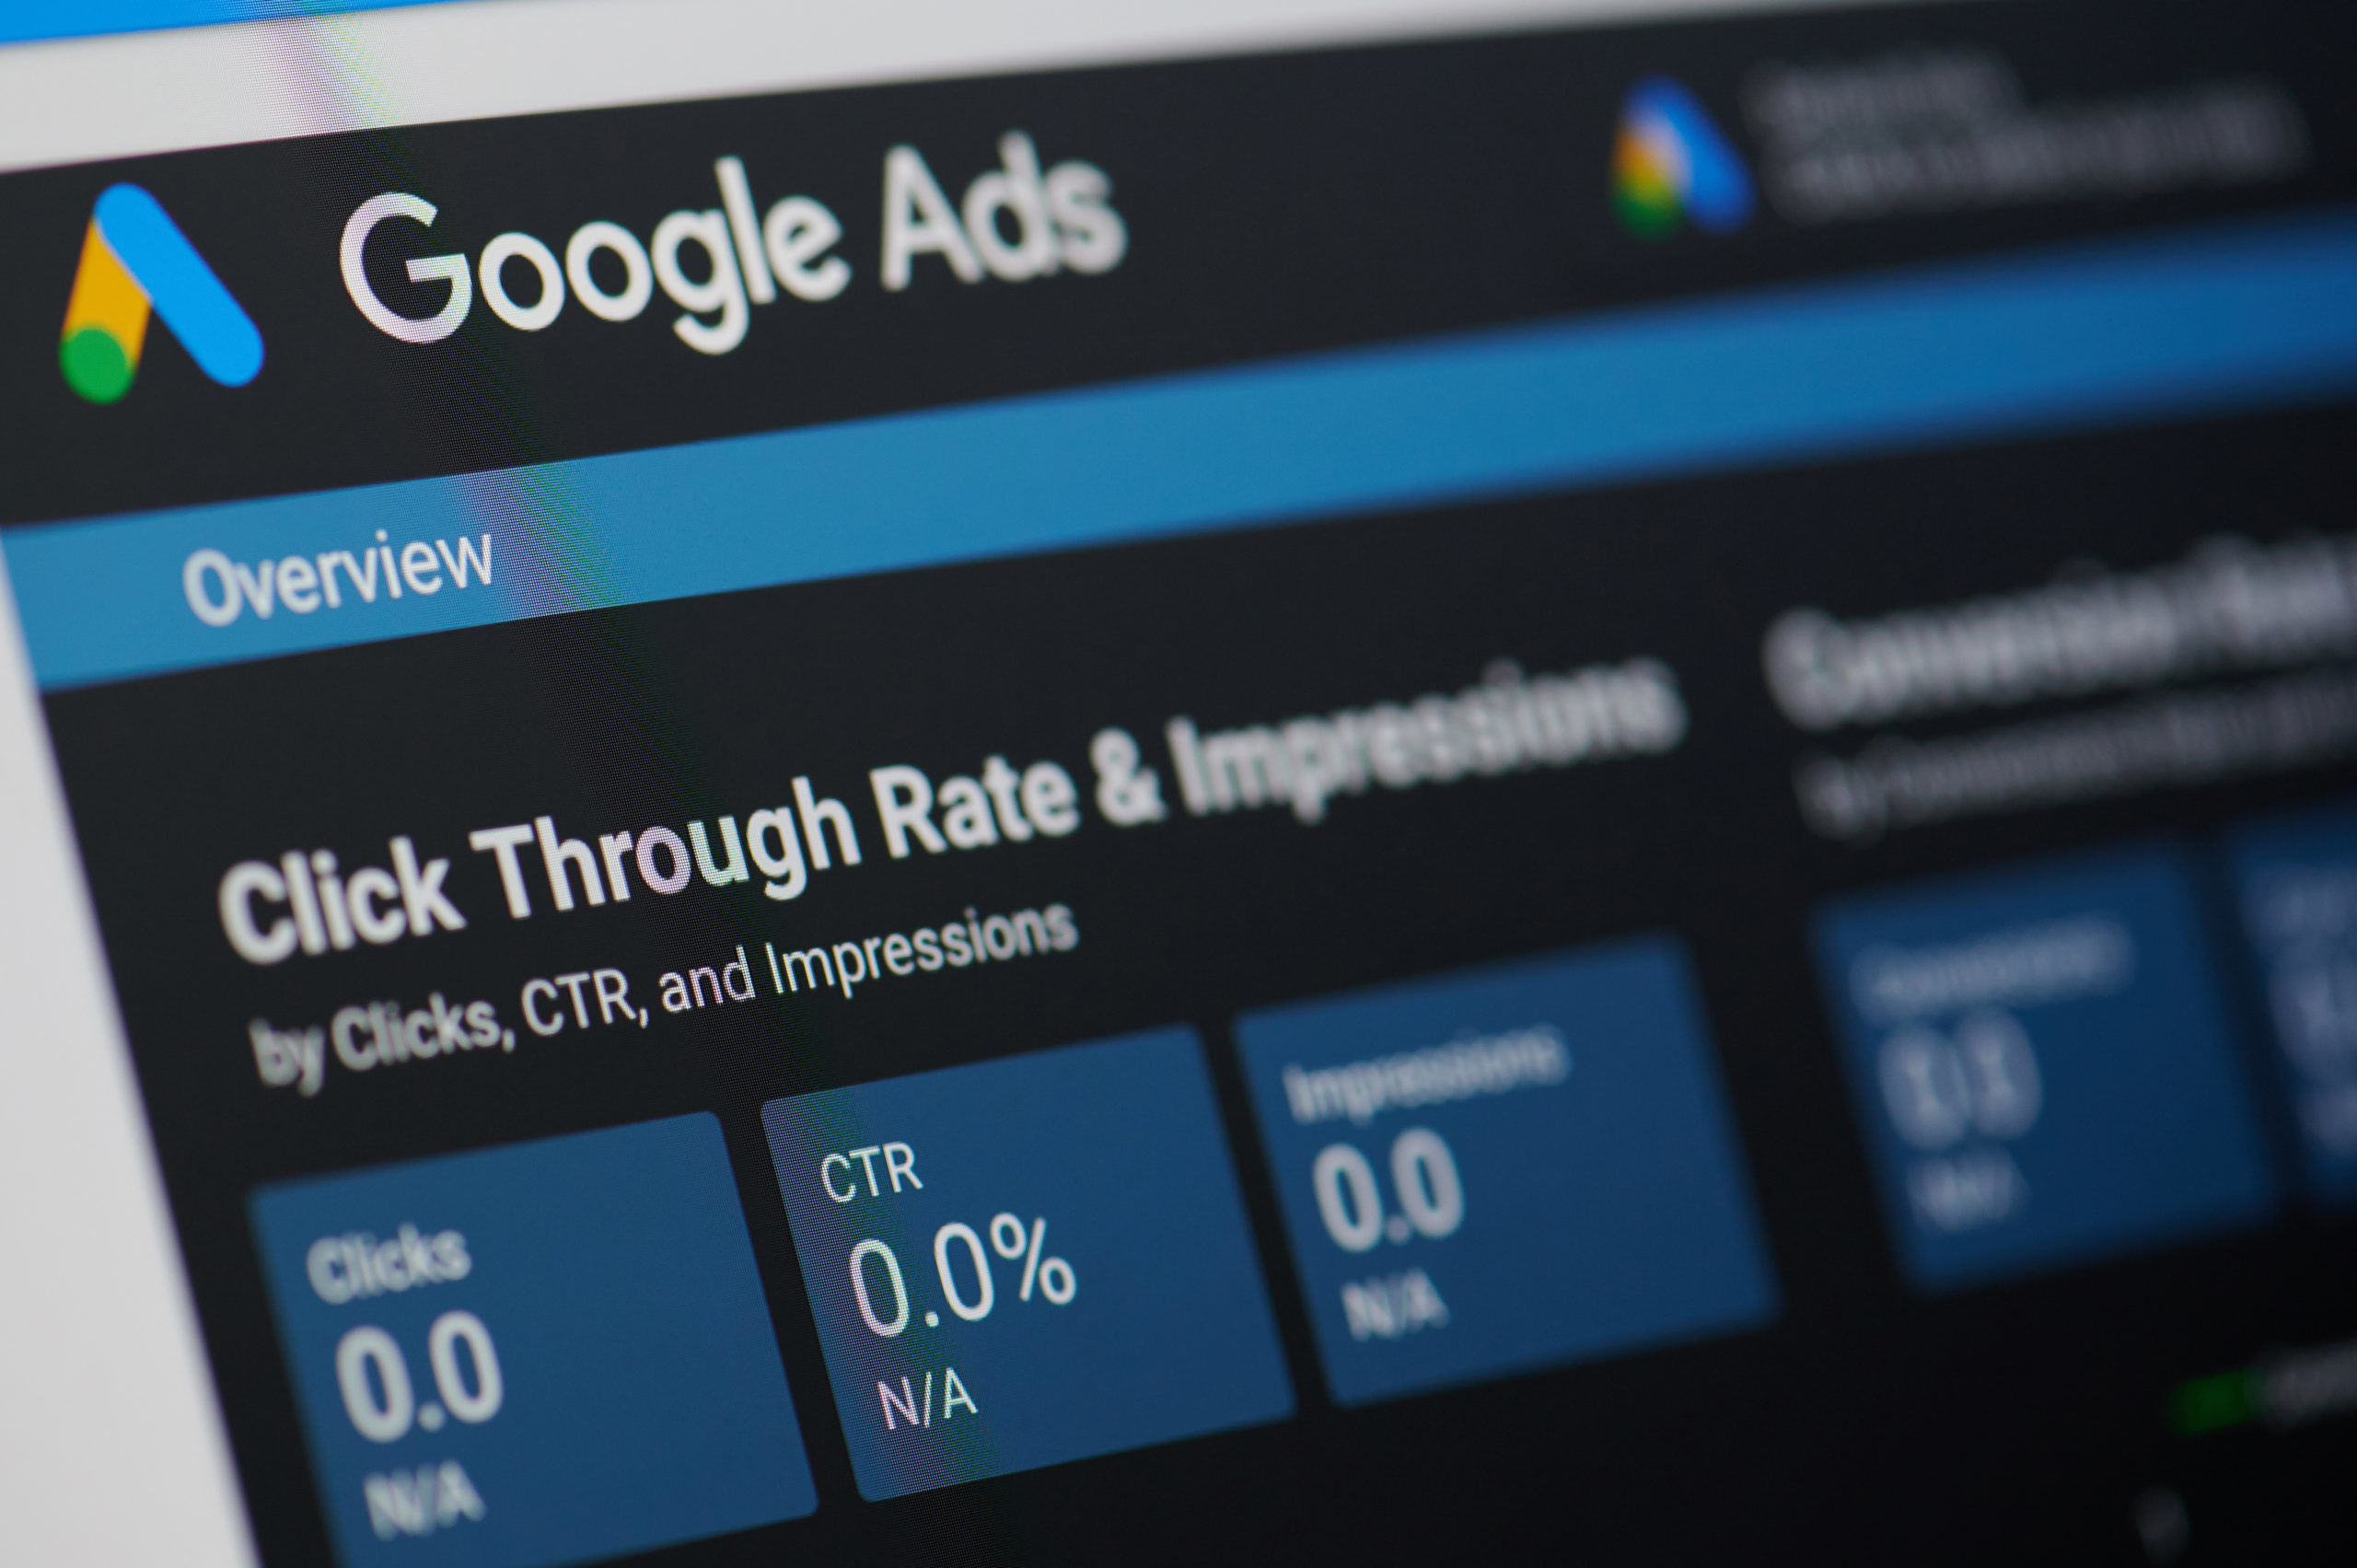 Google ads menu | Google Ads Marketing